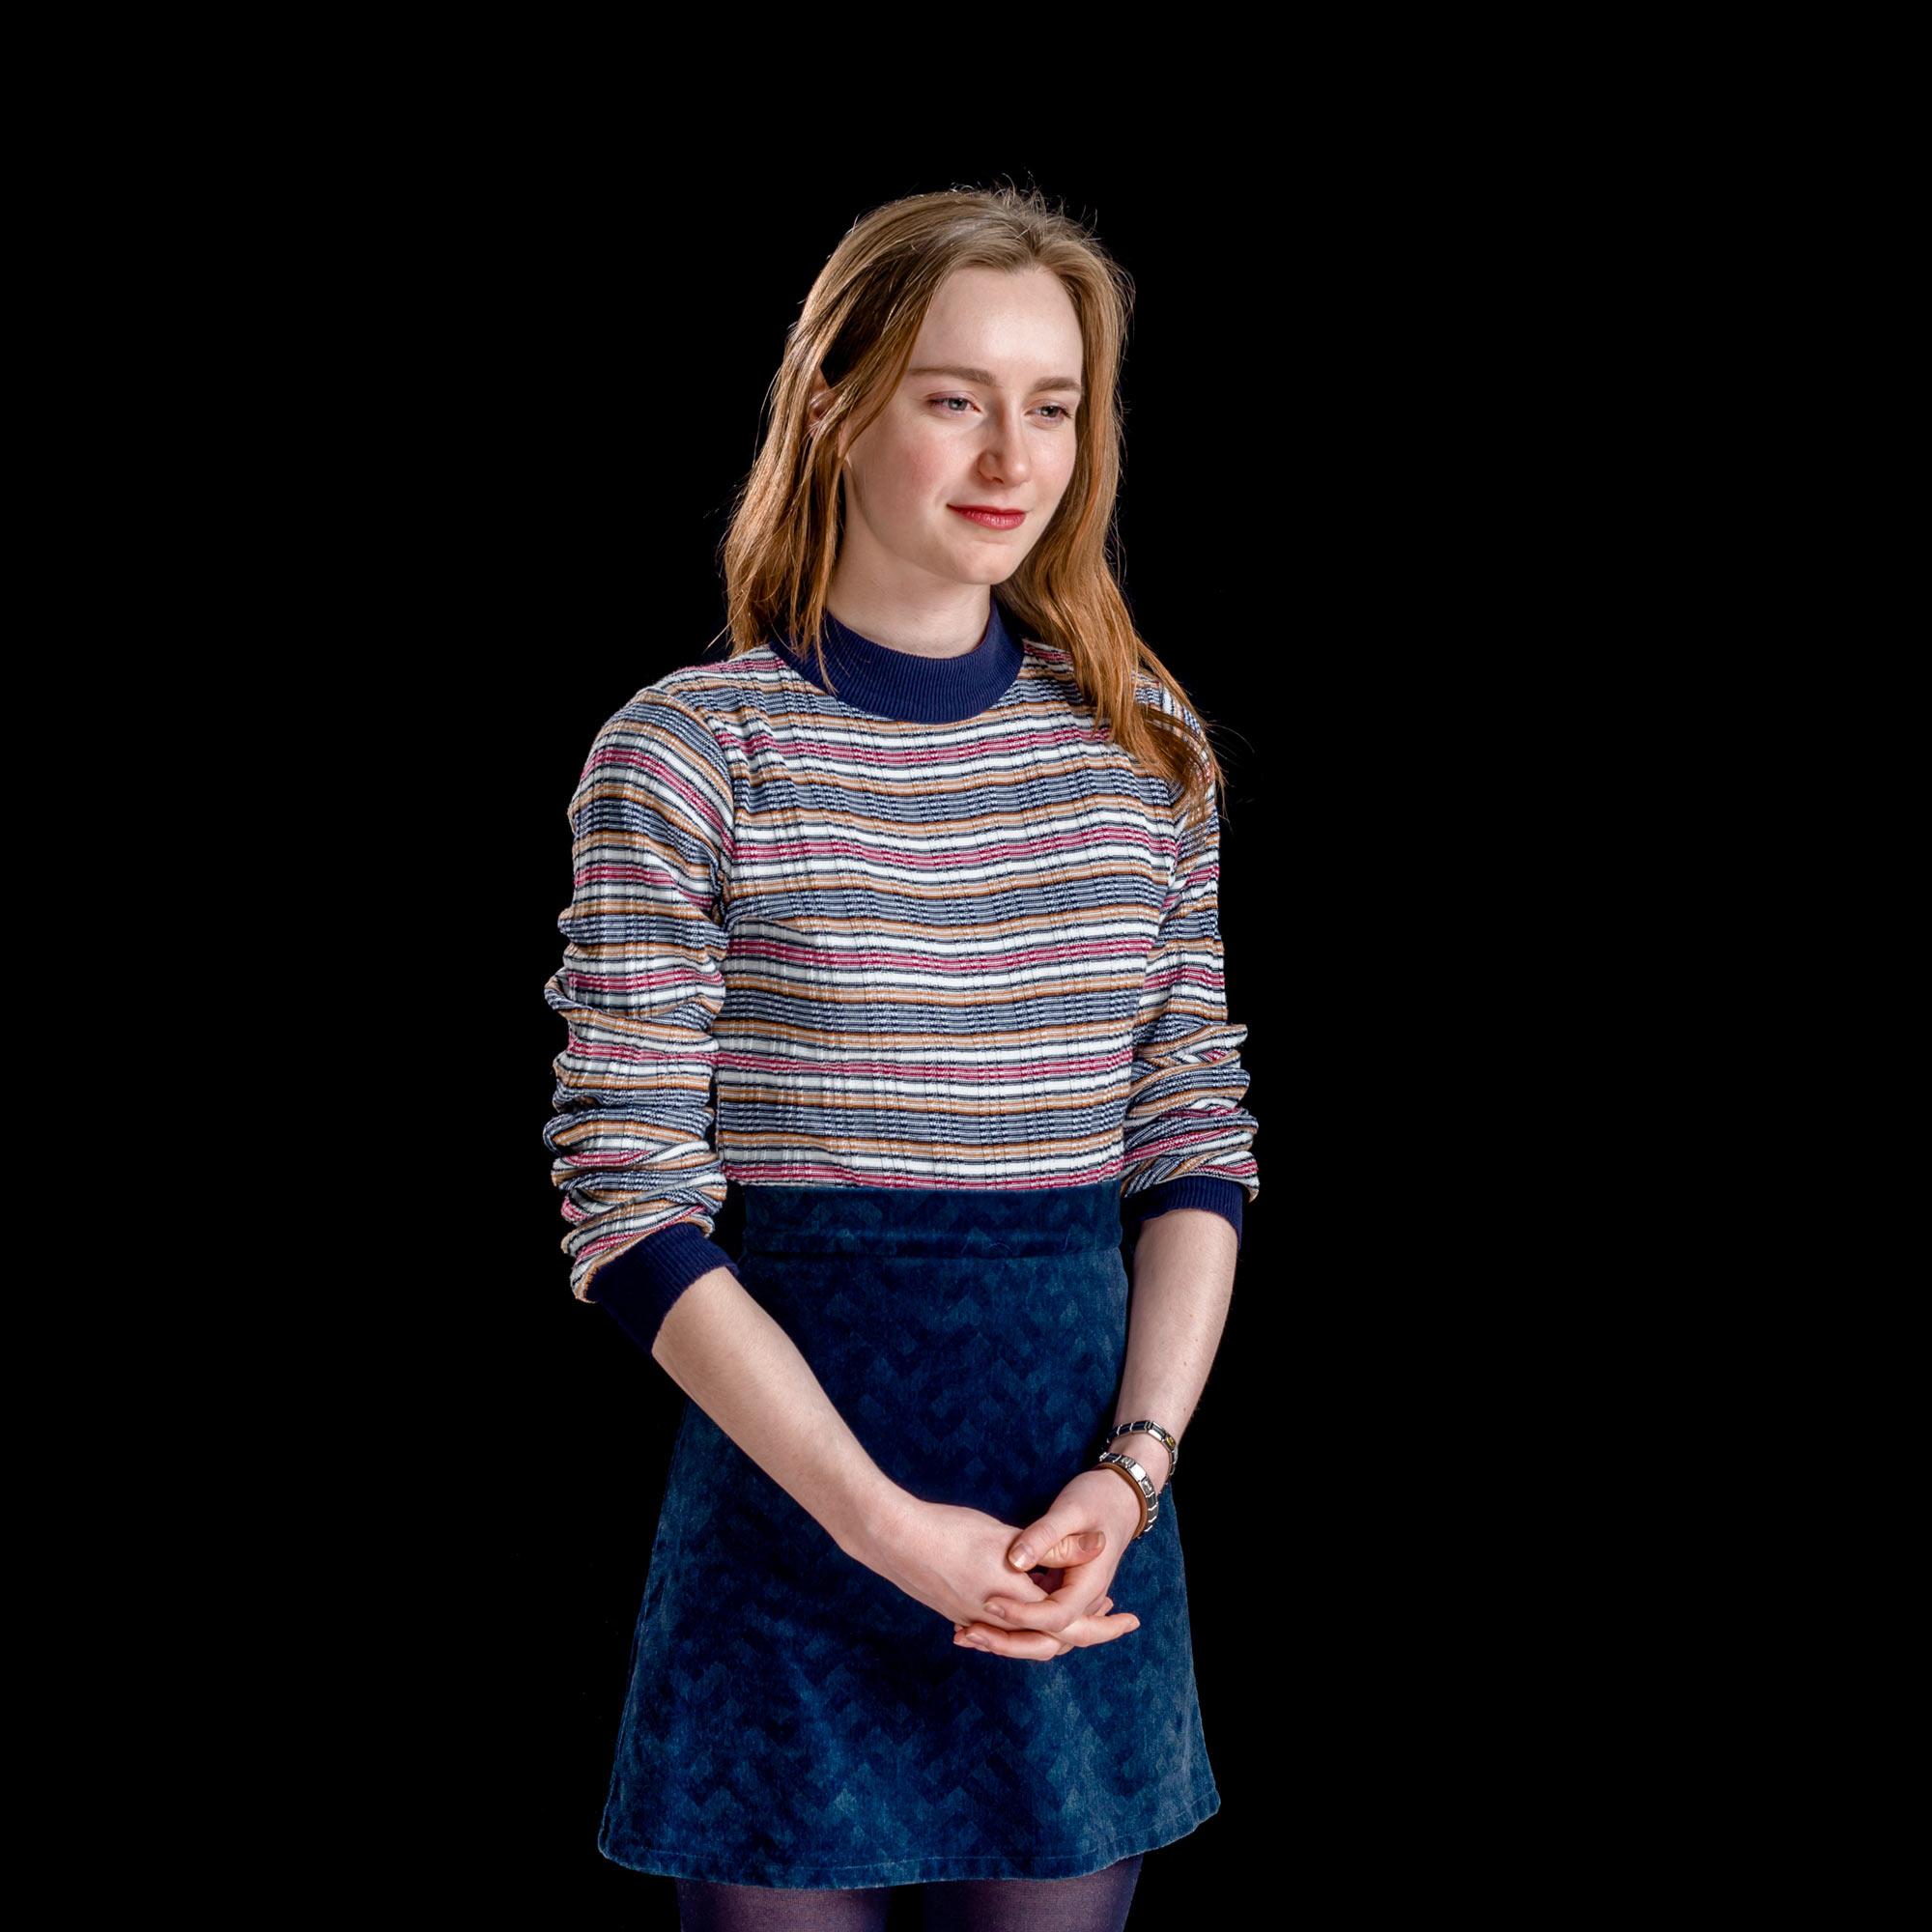 Hanna Lawson